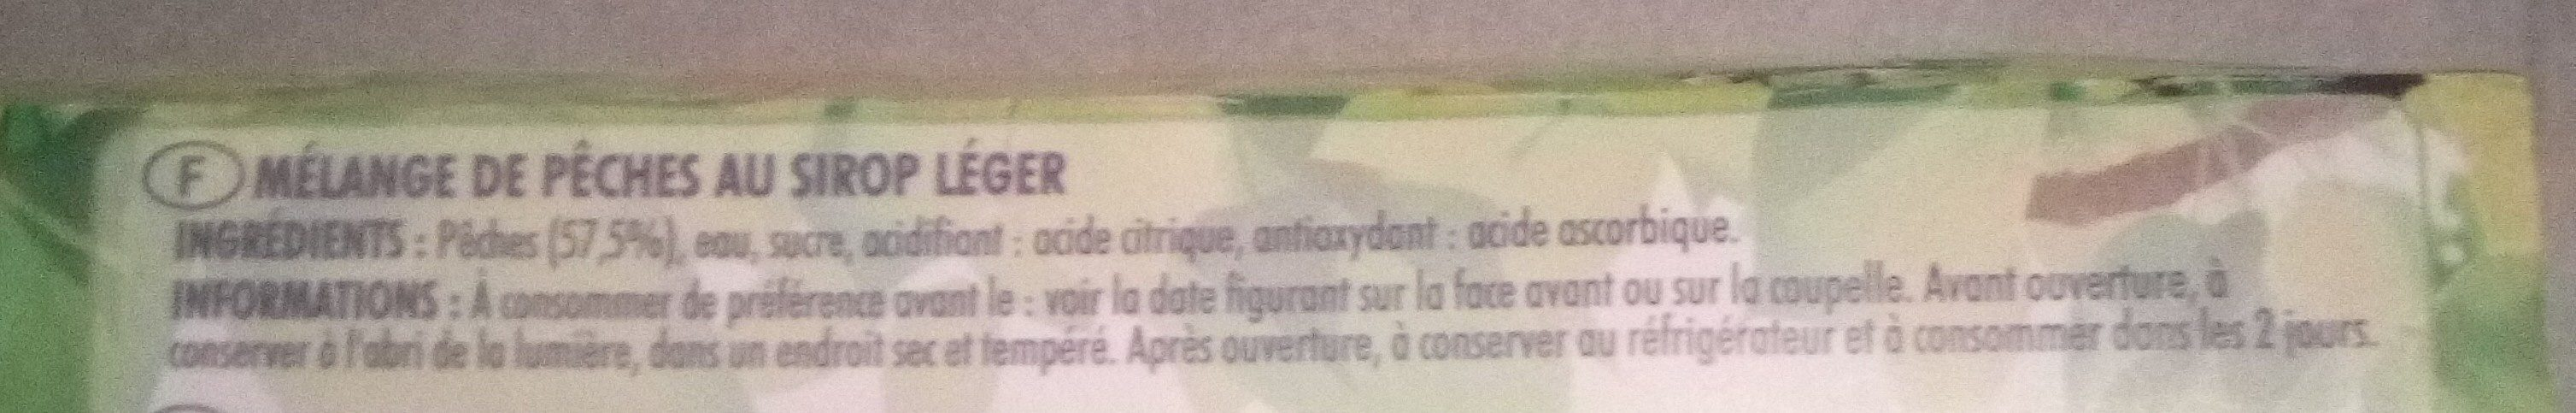 PAQUITO MELANGE FRT EXO 4X113G - Ingredients - fr